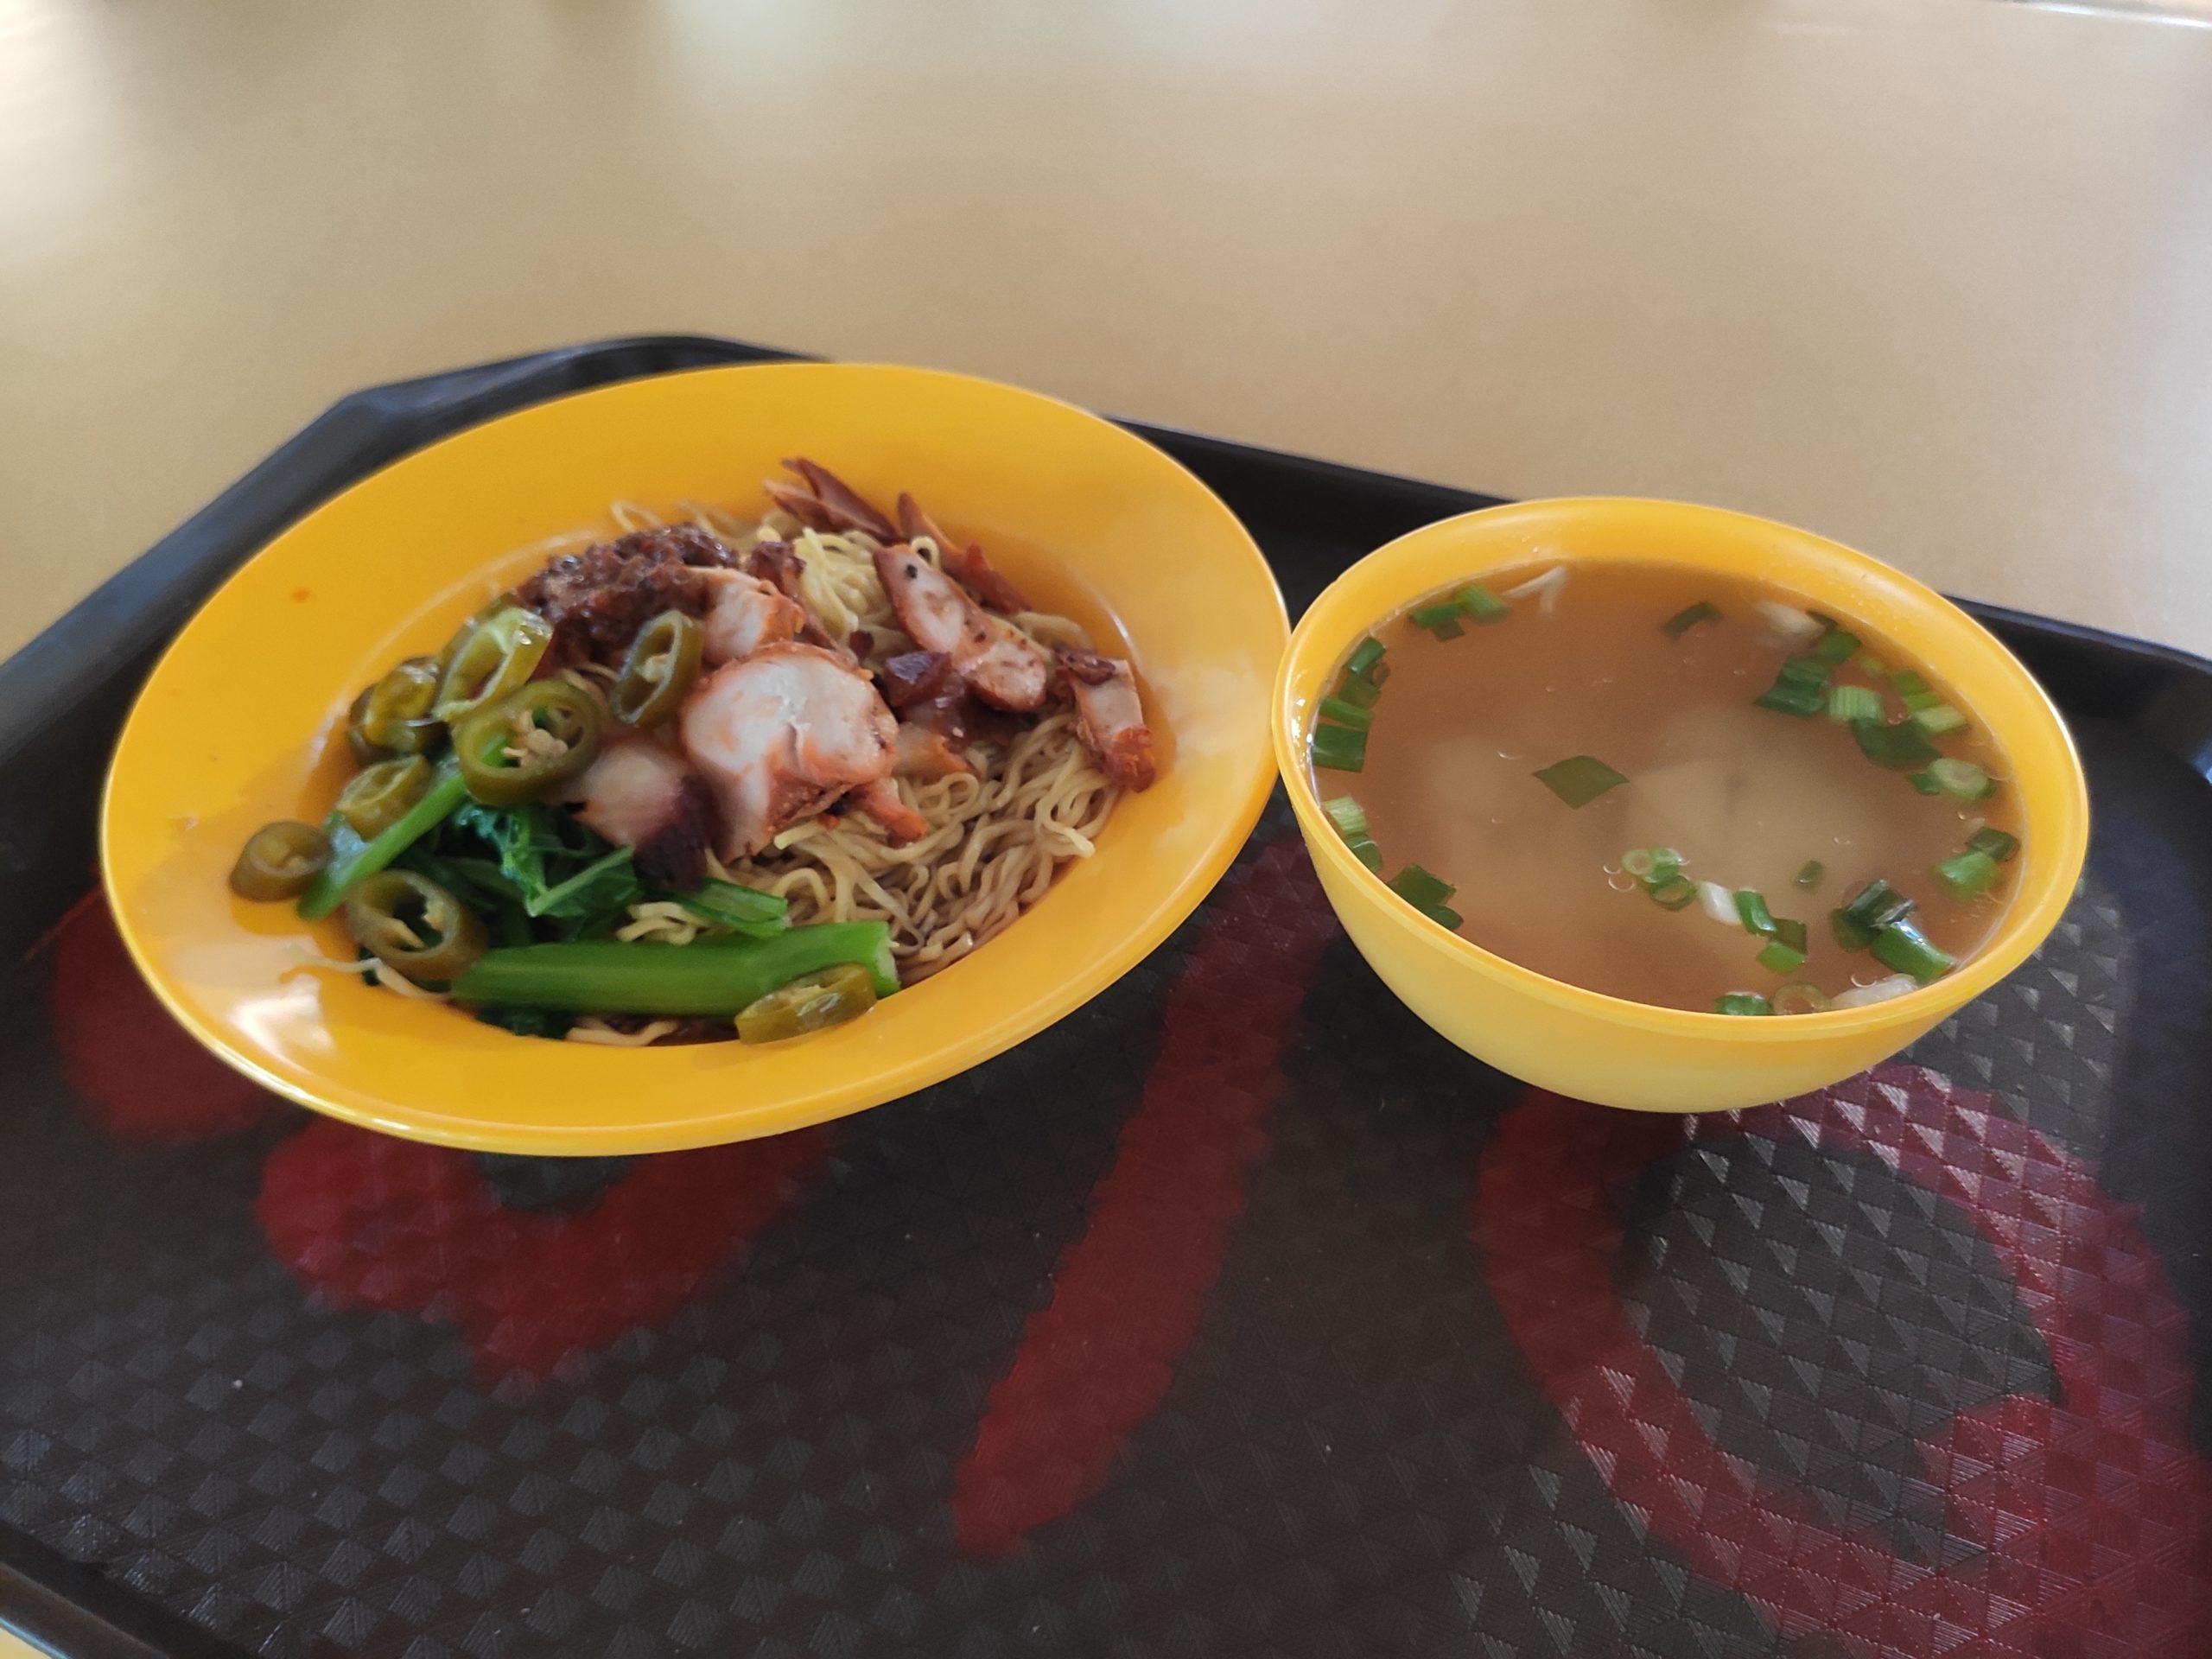 Kowloon Wanton Mee: Wanton Mee with Soup